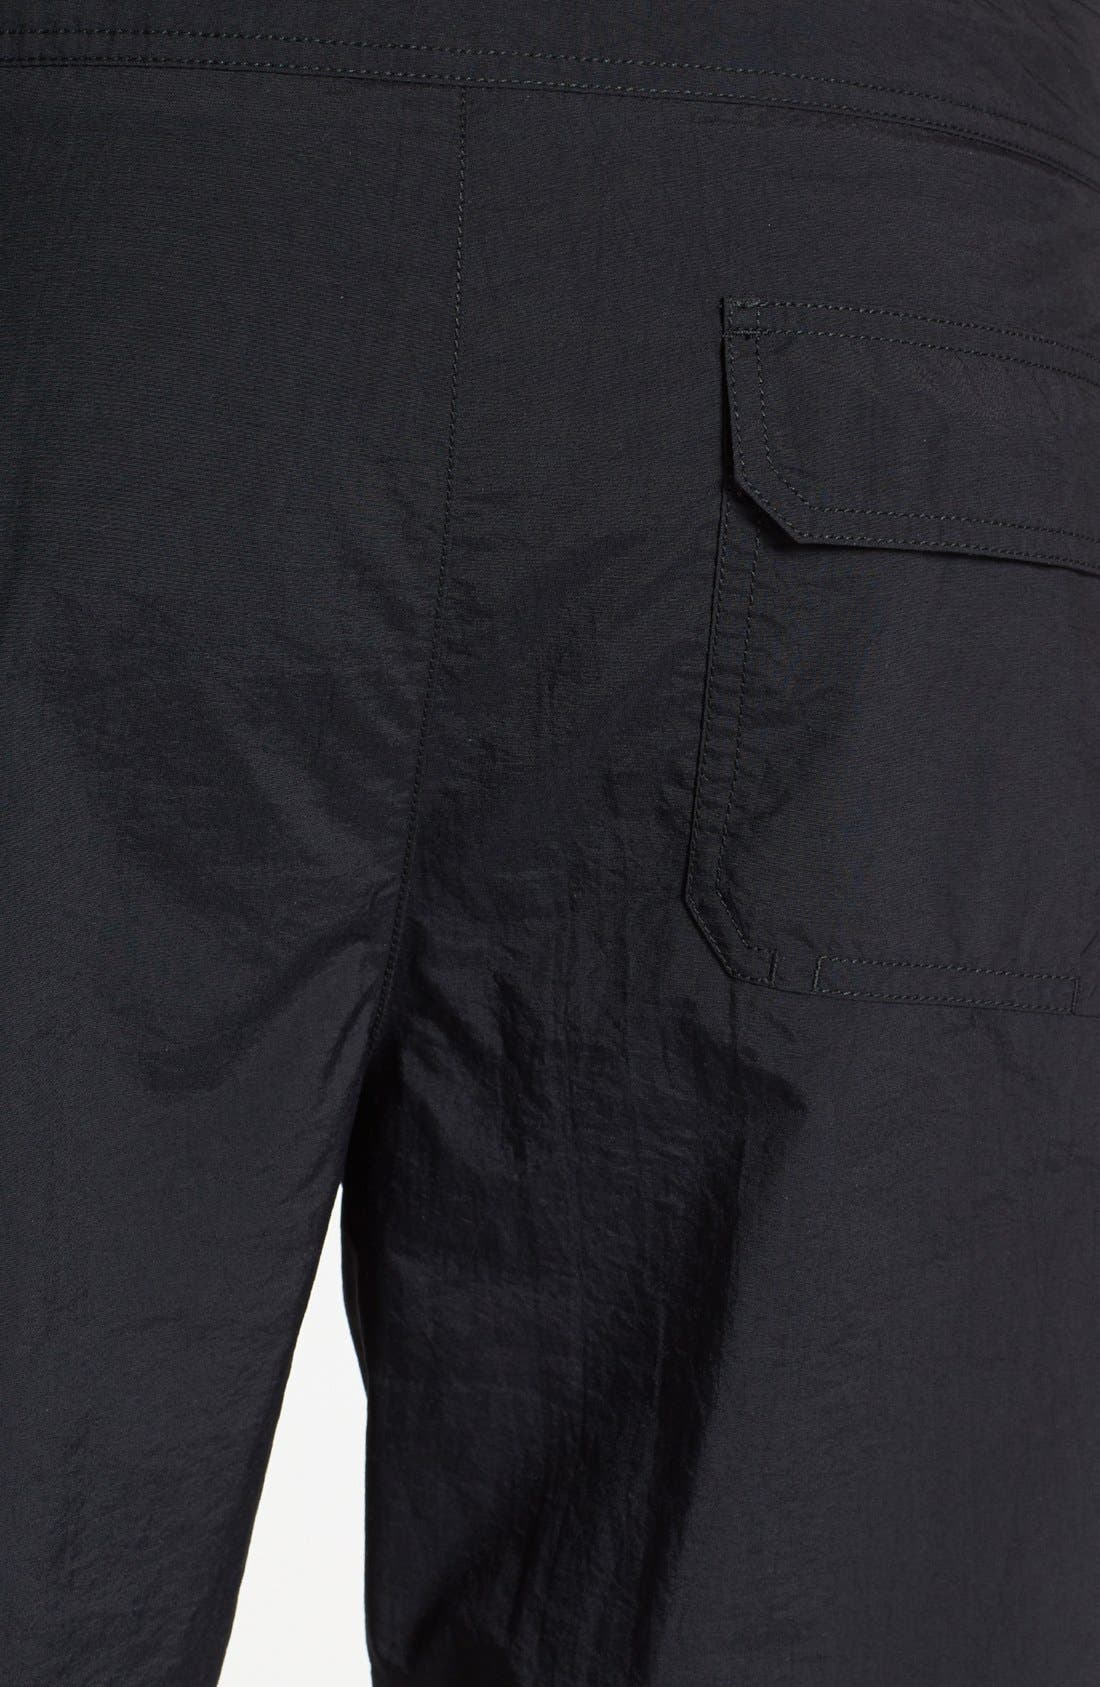 Alternate Image 3  - Burberry Brit 'Wainwright' Board Shorts